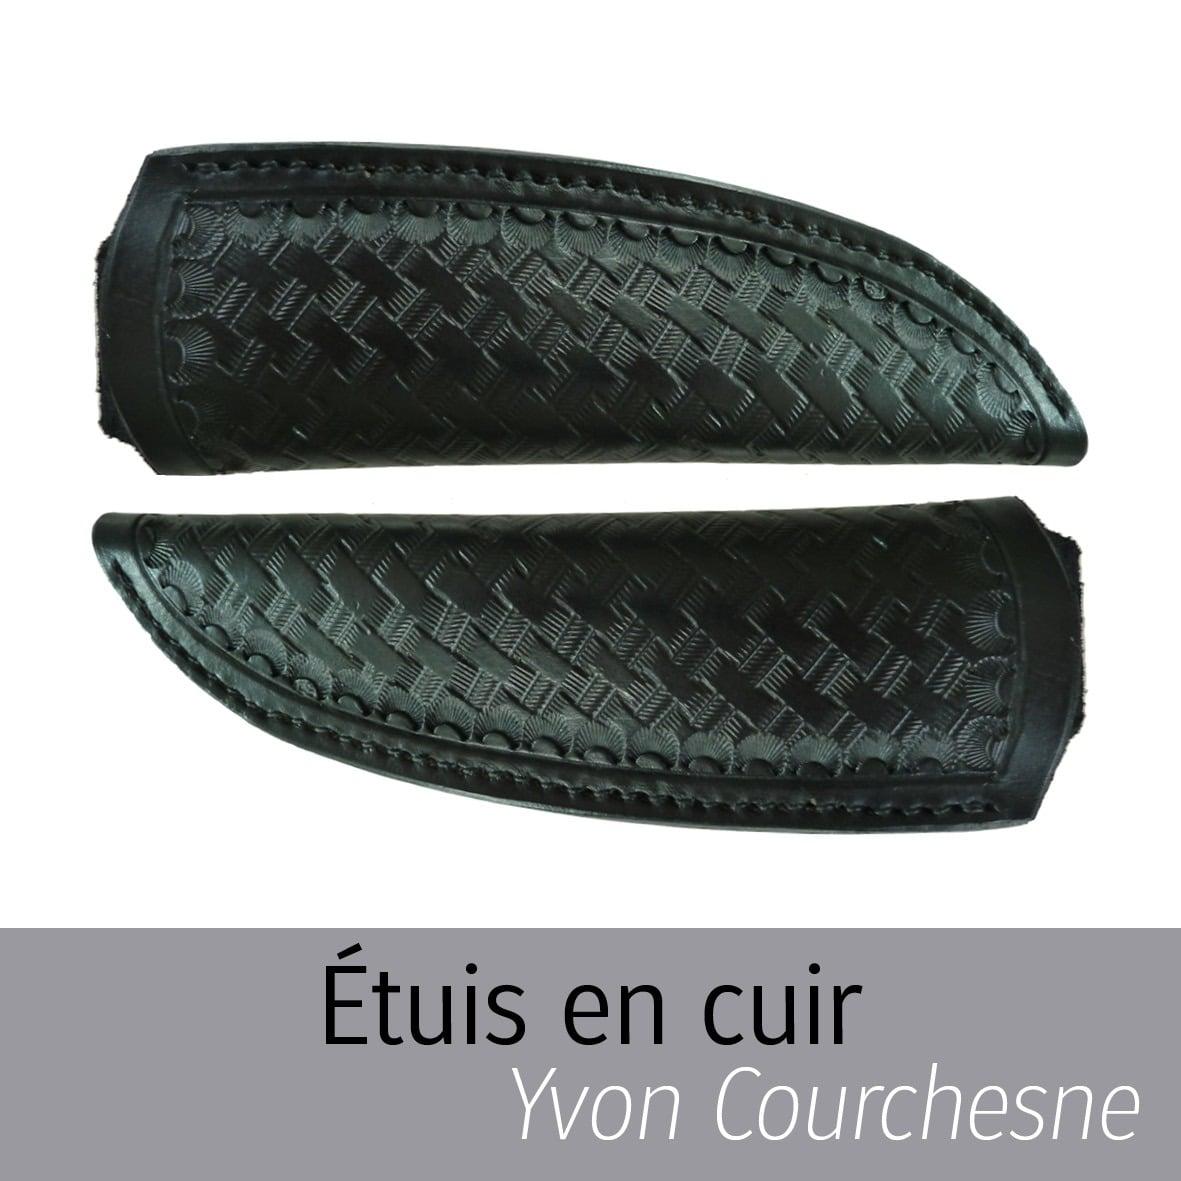 Étuis en cuir Yvon Courchesne